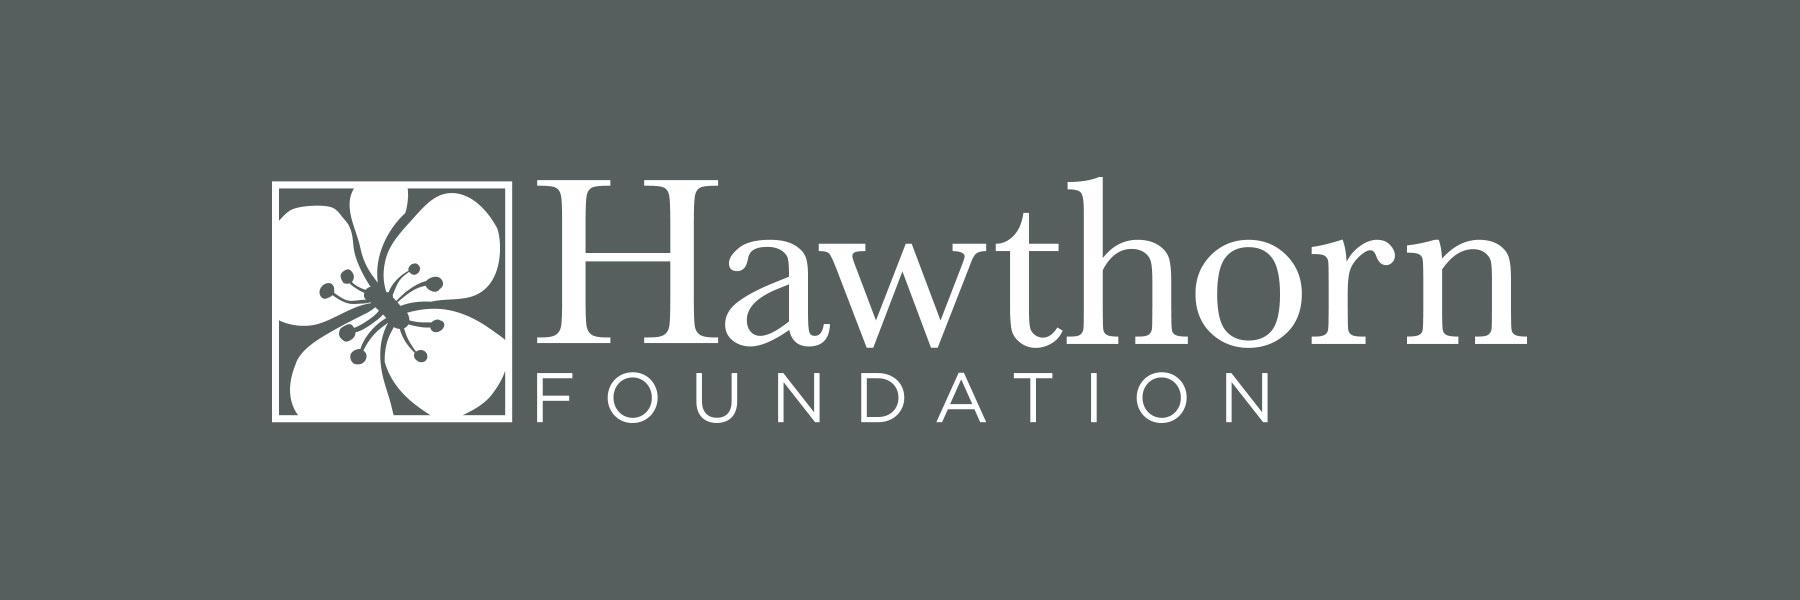 HawthornFoundation_Reverse